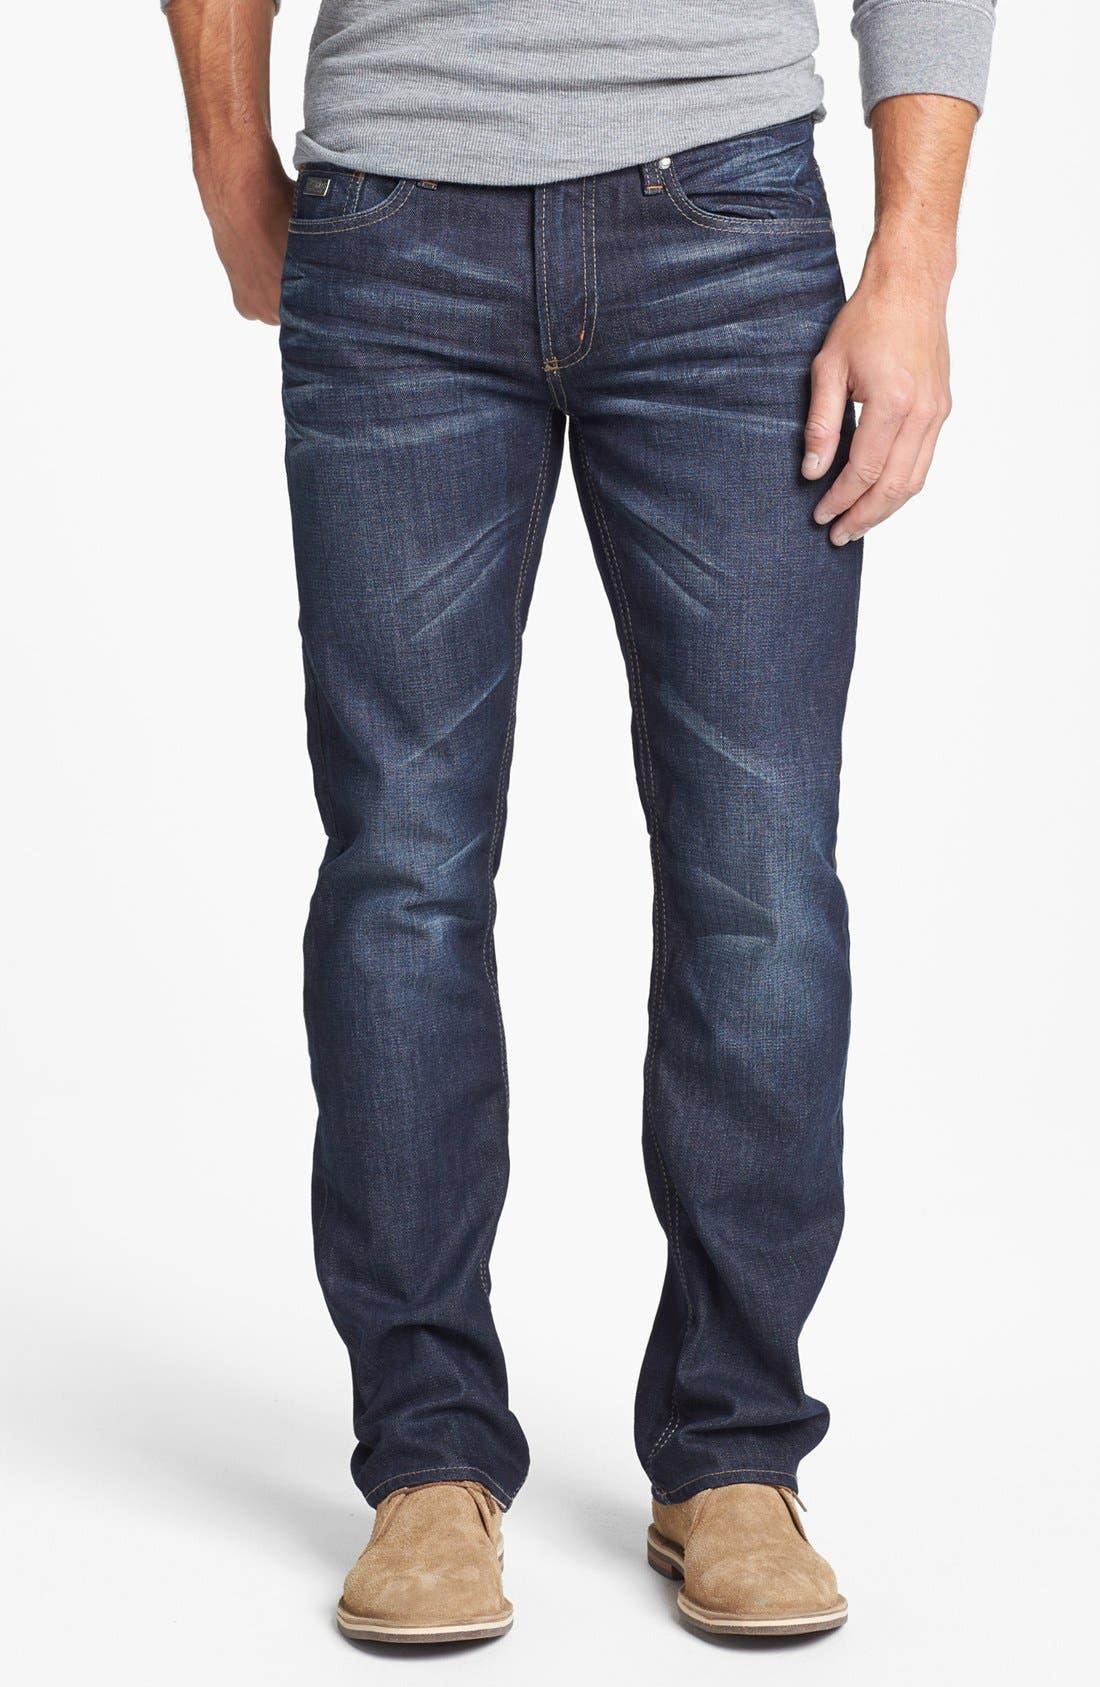 Main Image - Buffalo Jeans 'Six' Straight Leg Jeans (Slightly Washed)